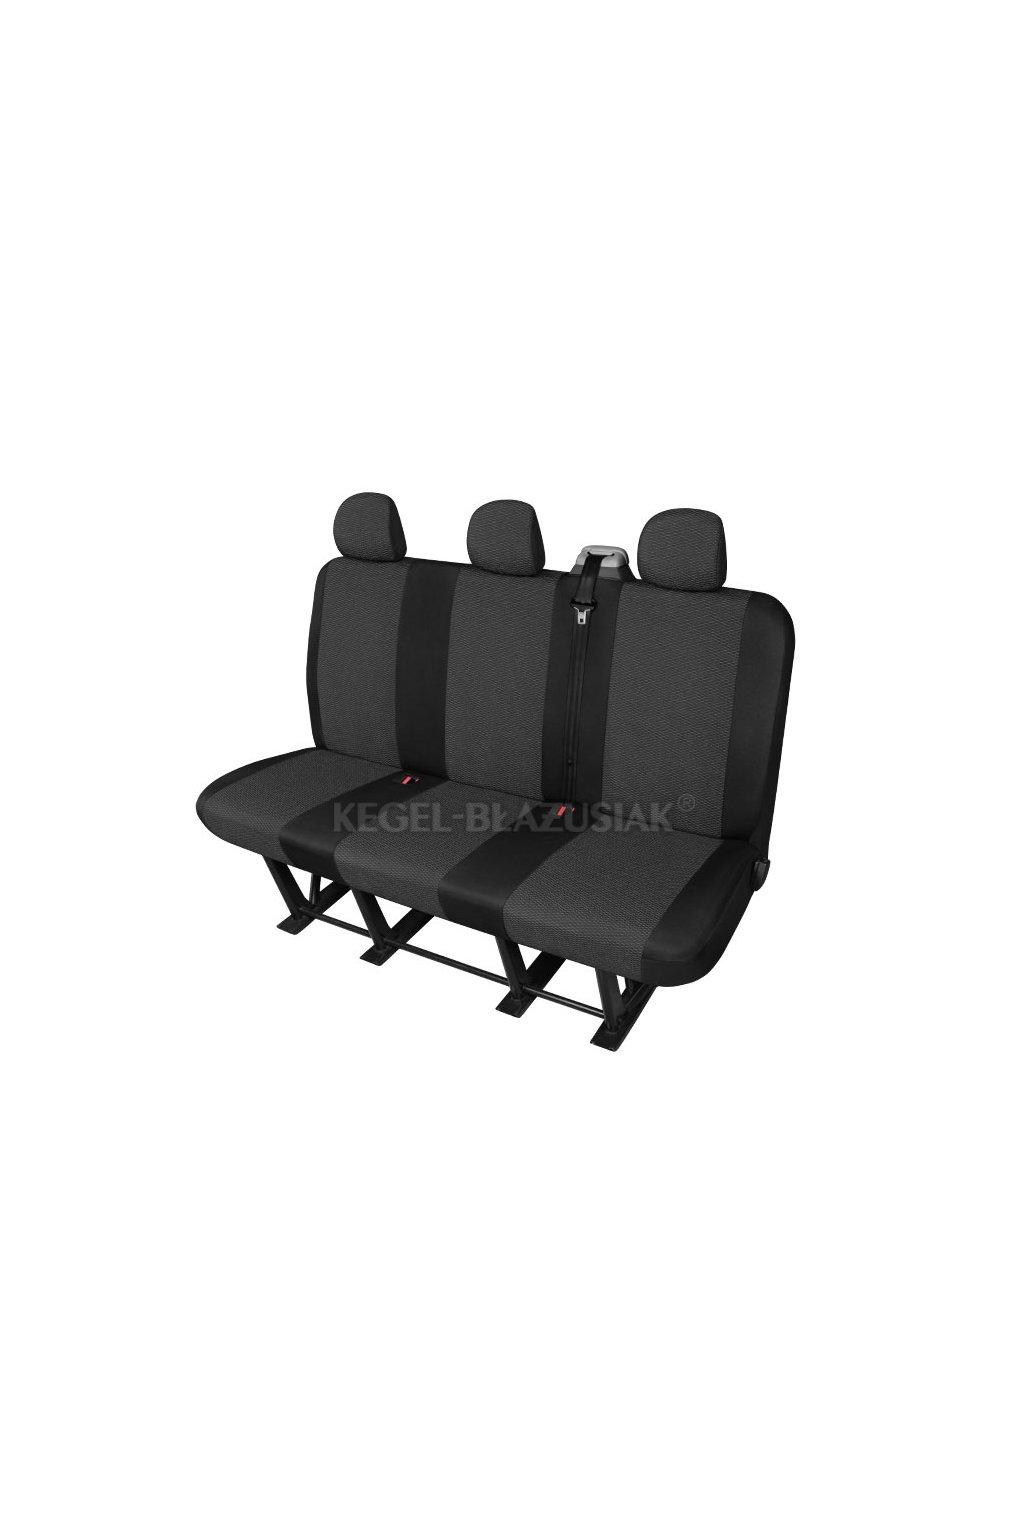 1310 autopotah delivery van practical ares dv3 opel vivaro